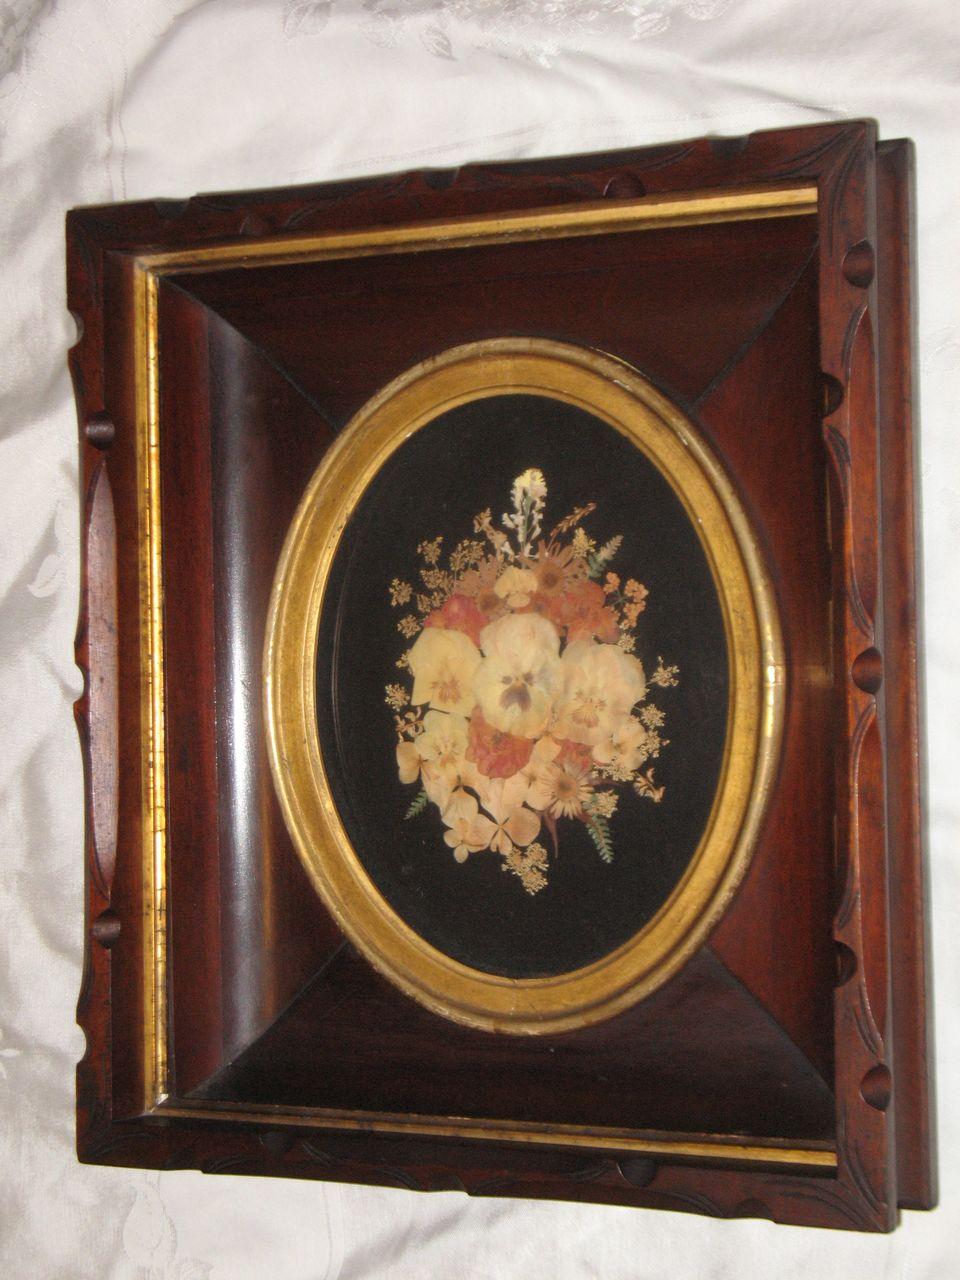 Antique Decorative Deep Walnut Victorian Picture Frame With Beautiful Flower Arrangement Circa 1880's